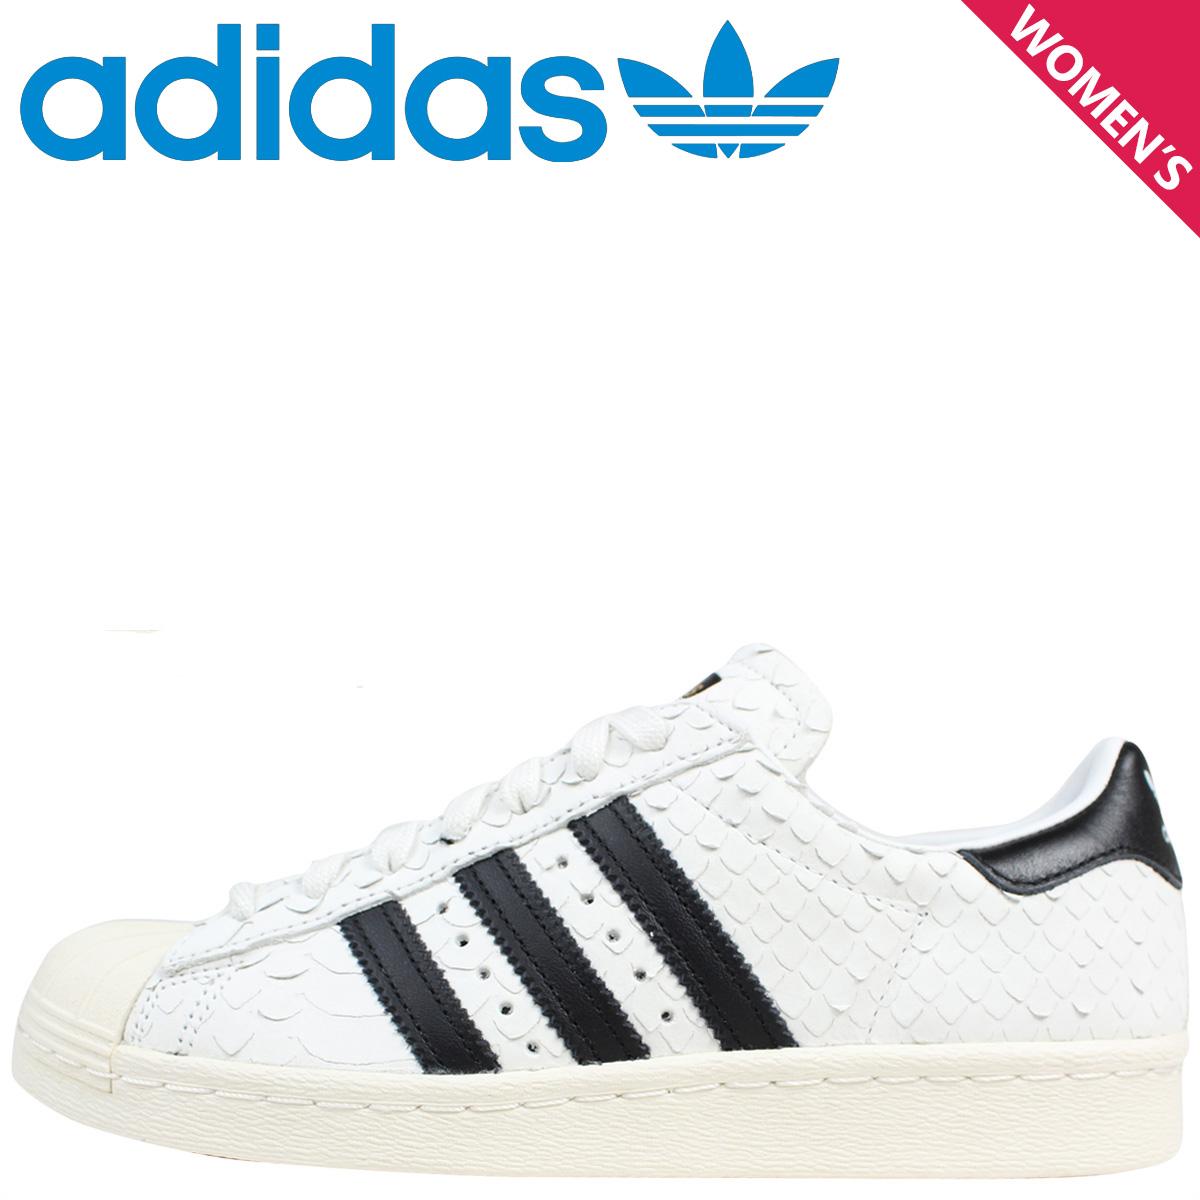 adidas Originals Adidas originals superstar sneakers Lady's SUPERSTAR 80S W S76414 shoes white white